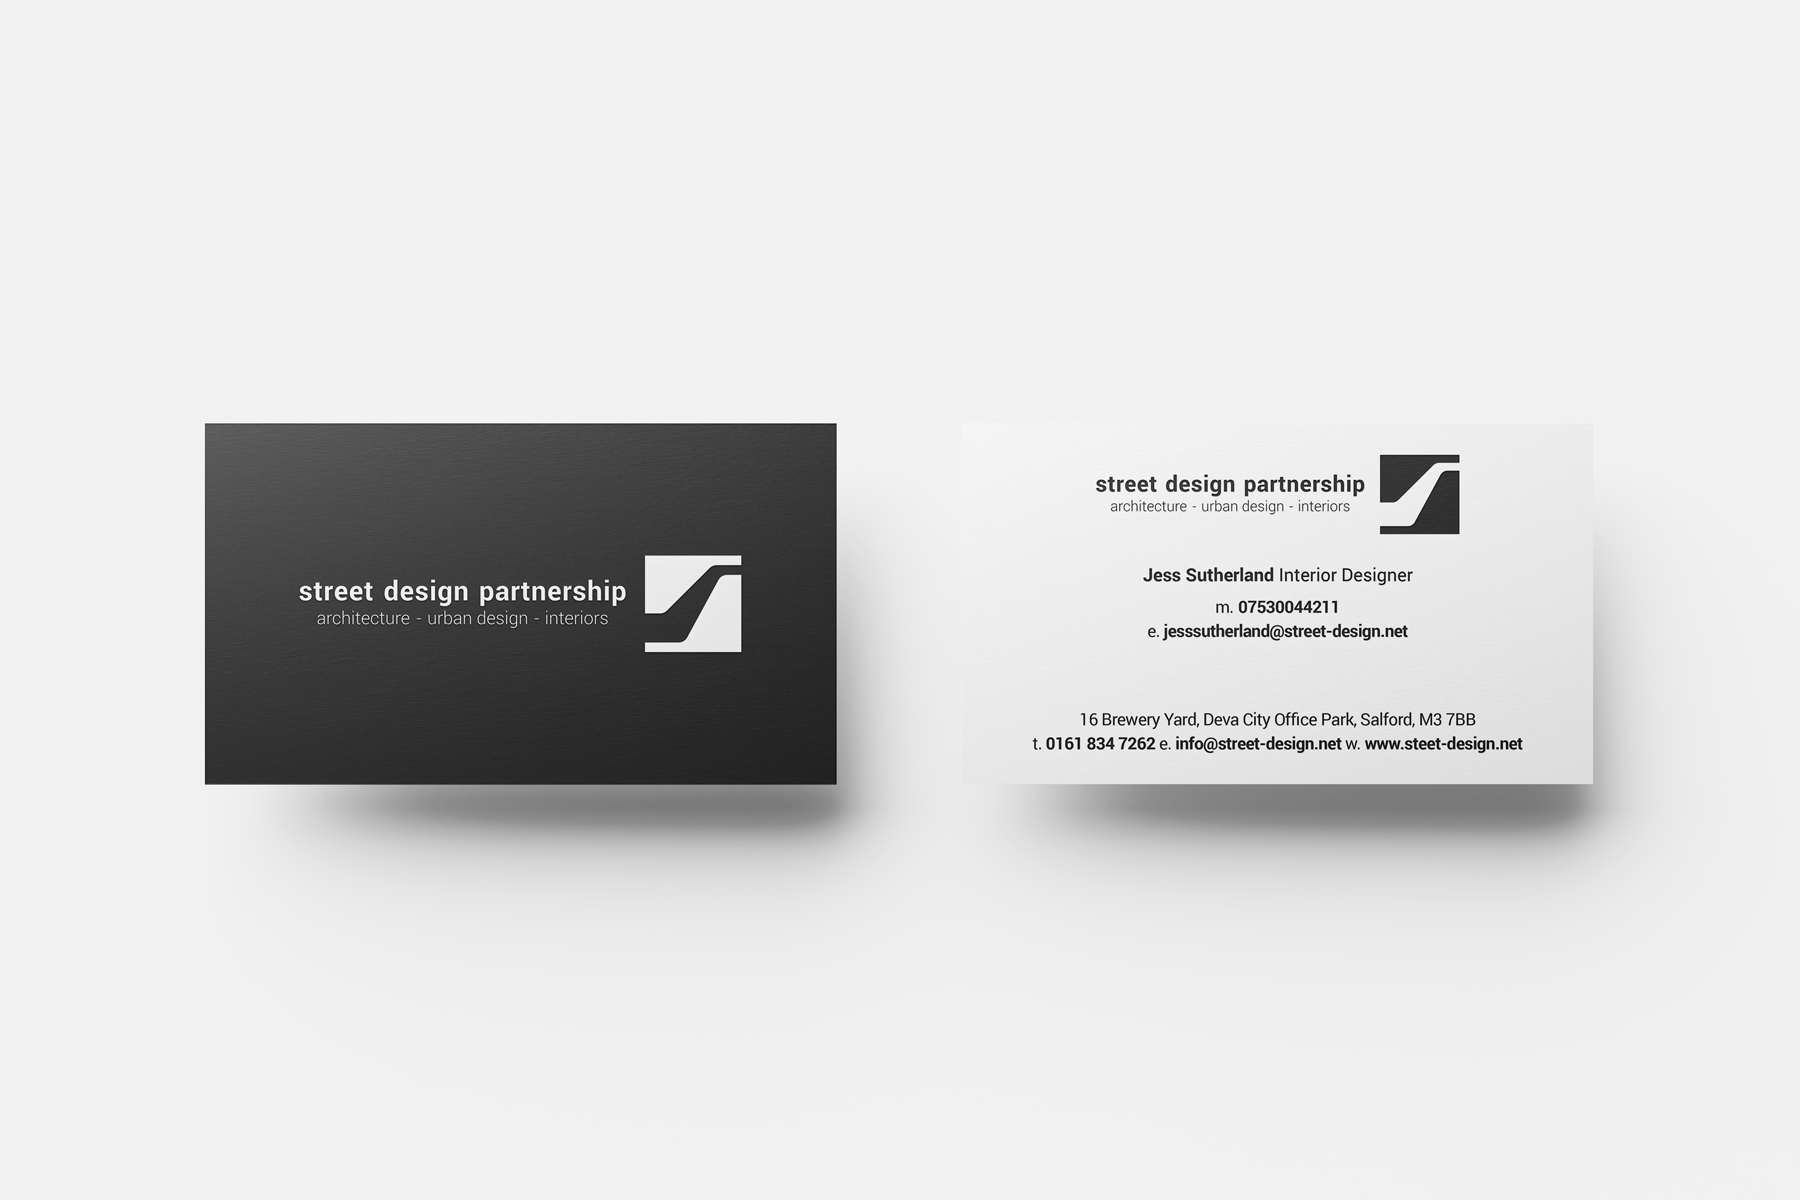 street design partnership business card